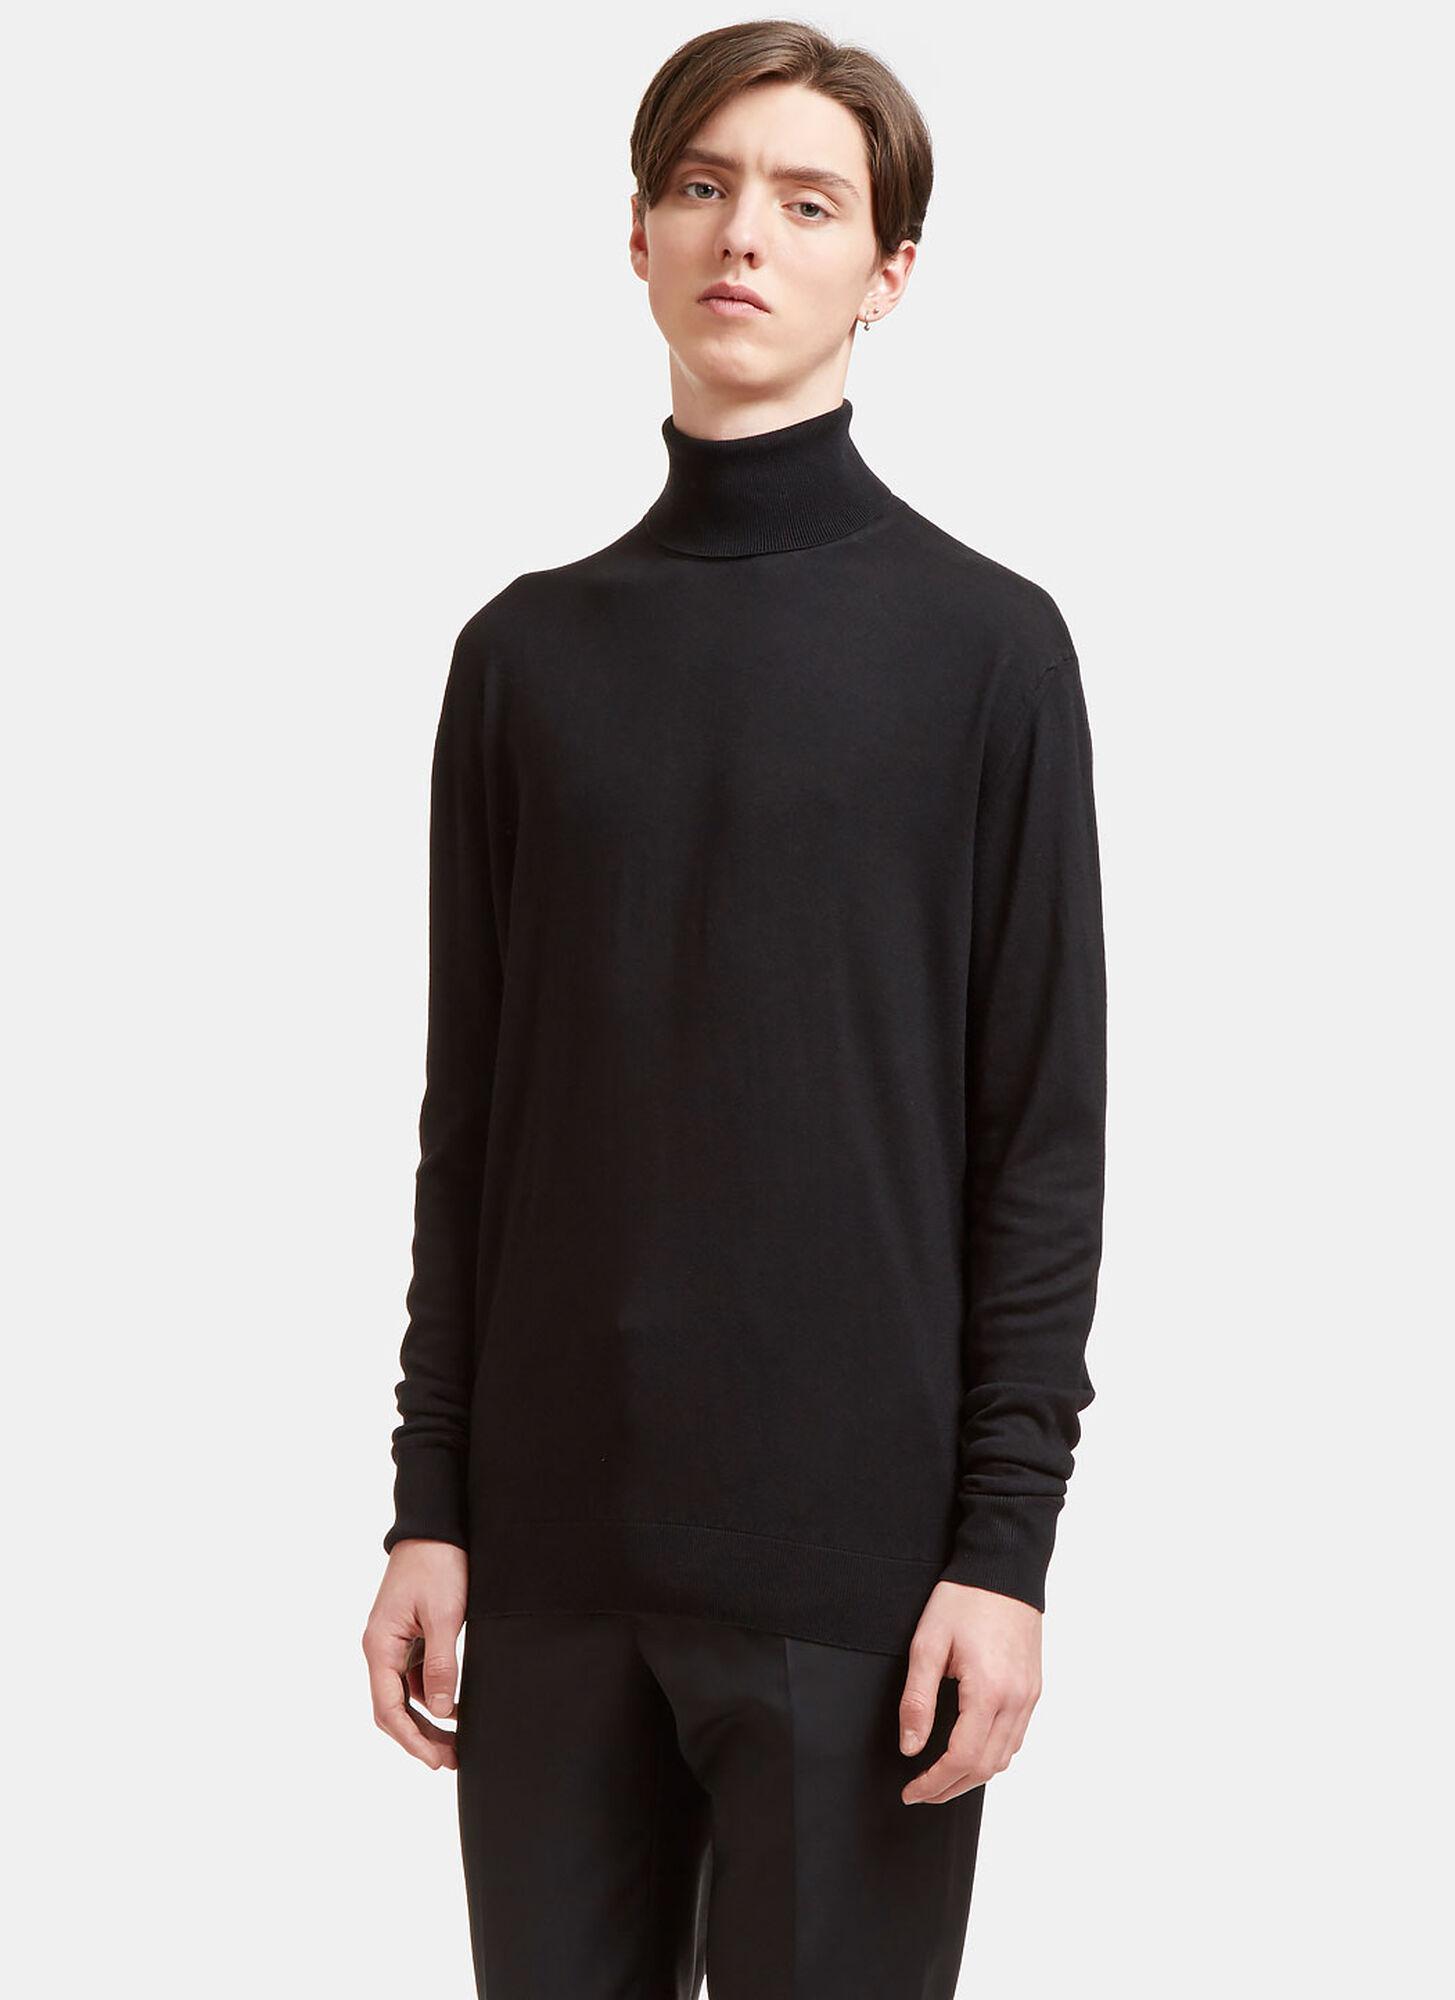 male Black 55% Silk, 45% Cashmere. Dry clean.